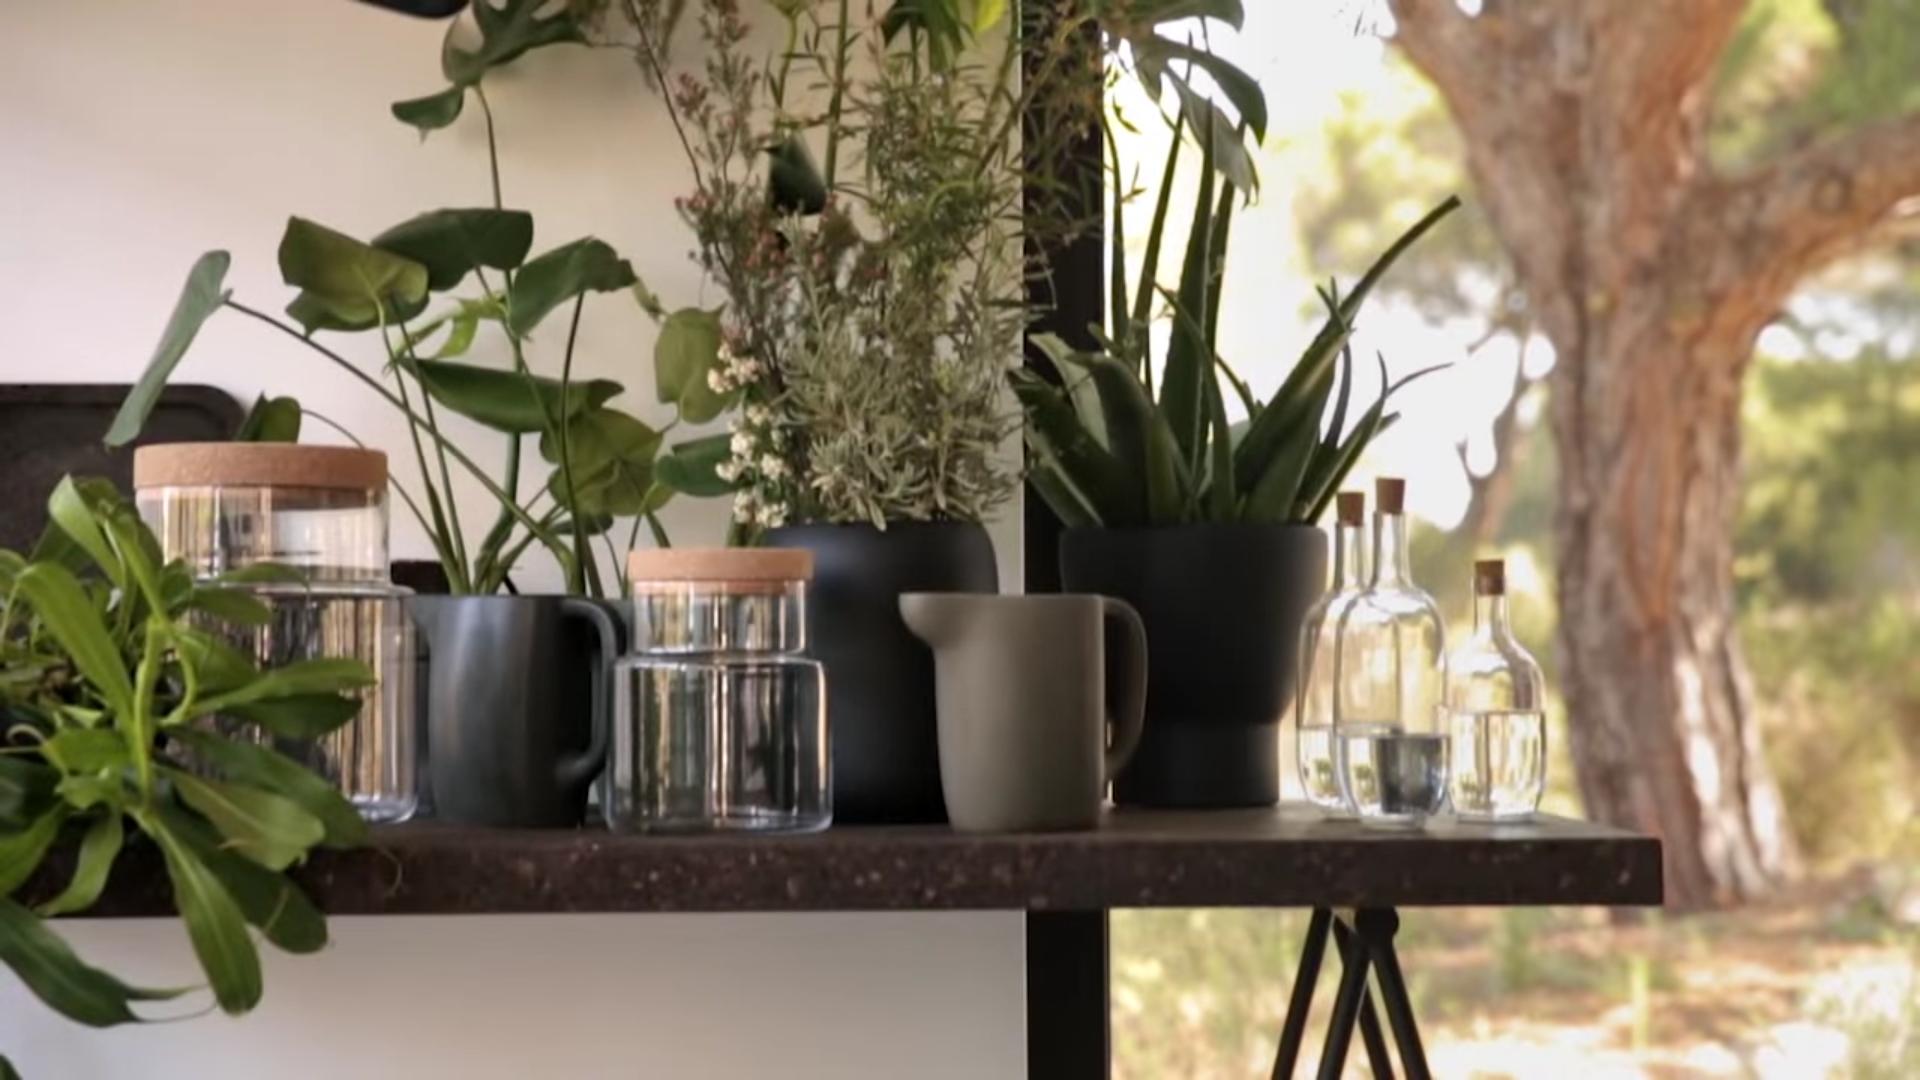 Ikea Sinnerlig Pots and Jars, made of cork